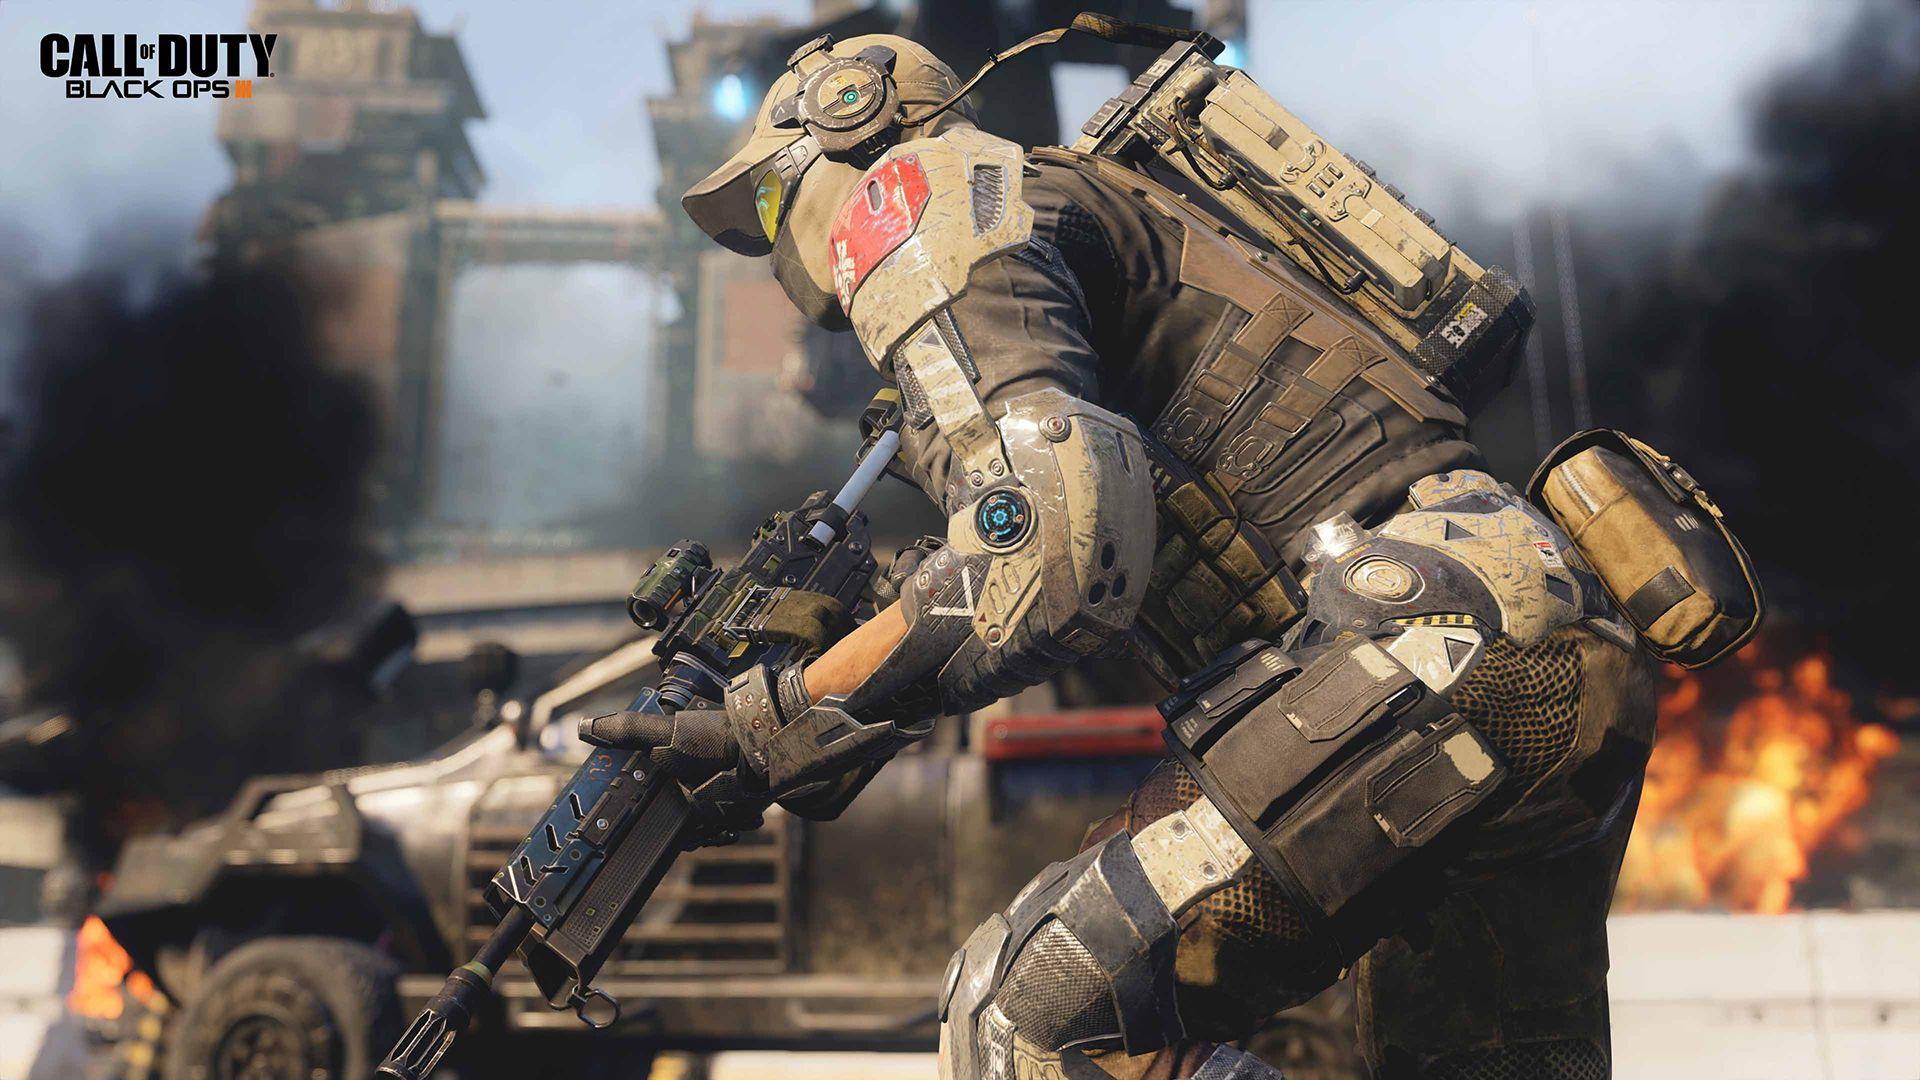 Call of Duty: Black Ops III (PC) - 8